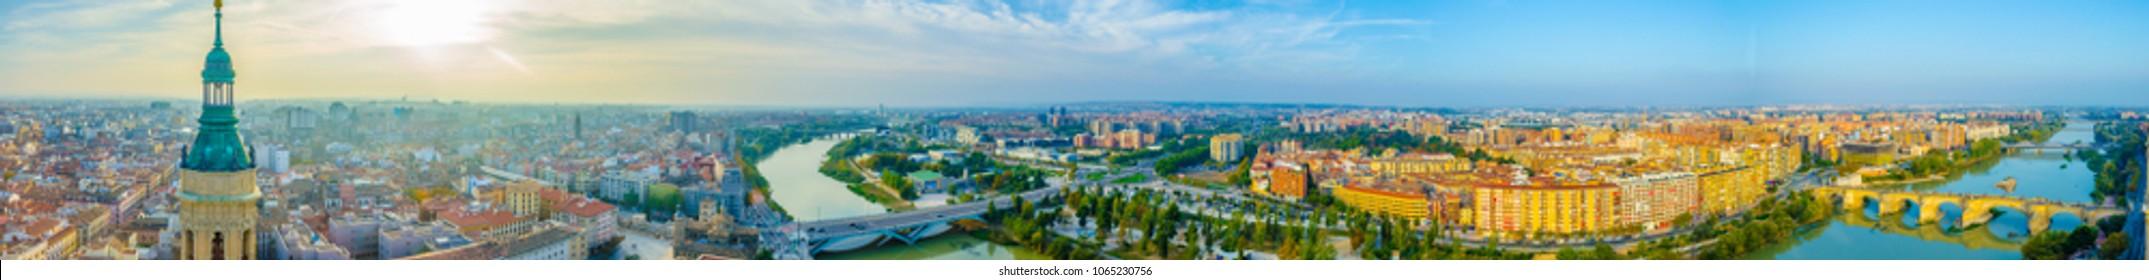 Aerial view of Zaragoza, Spain